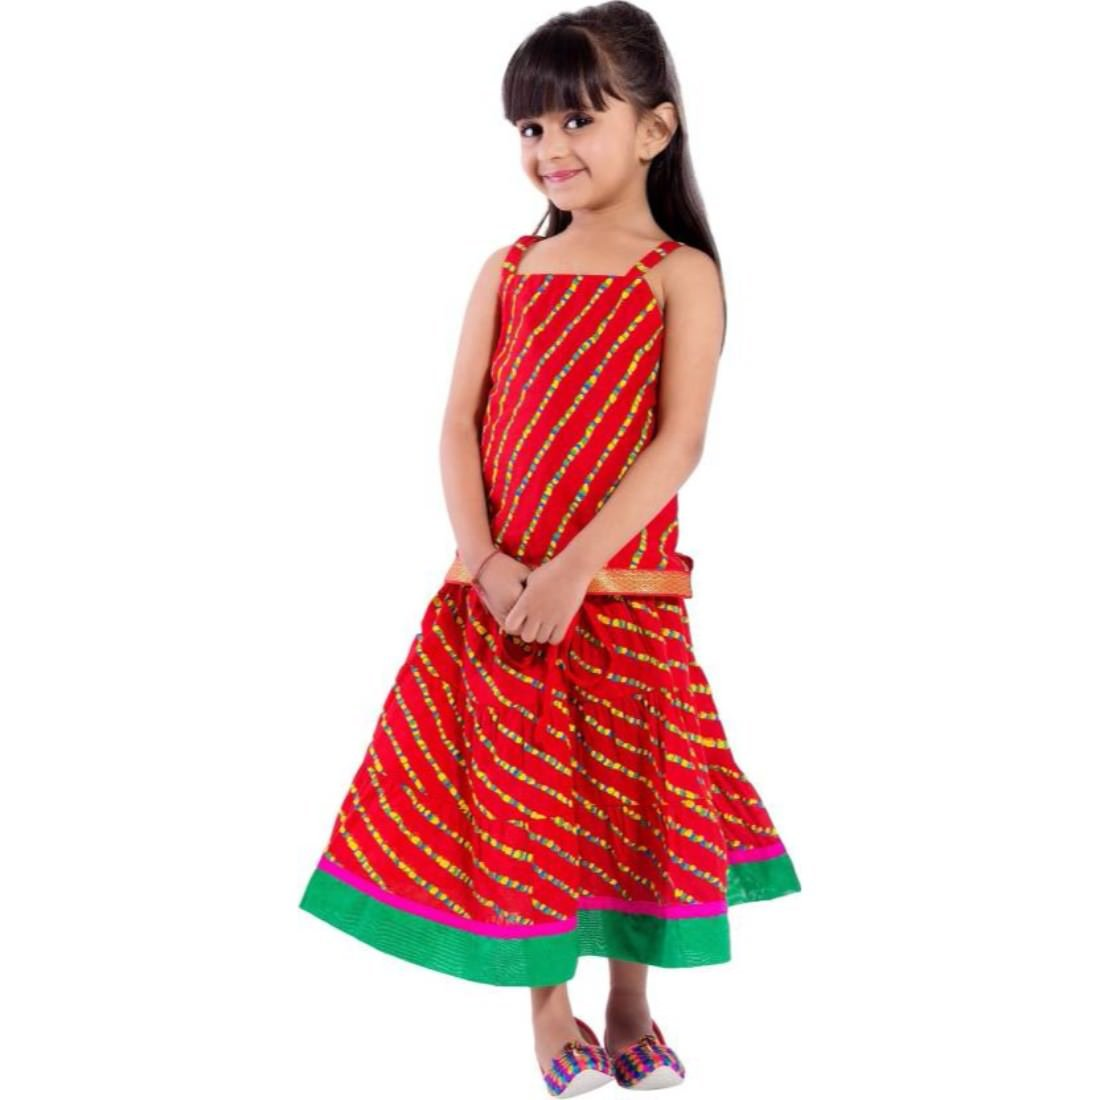 d5cea431aa Shop Frenzy Beautiful Kid's wear, Kids Lehenga Choli,girl lehenga choli,Ethnic  wear for baby girls,garba,navratri lehenga choli,ghagra choli for wedding  ...